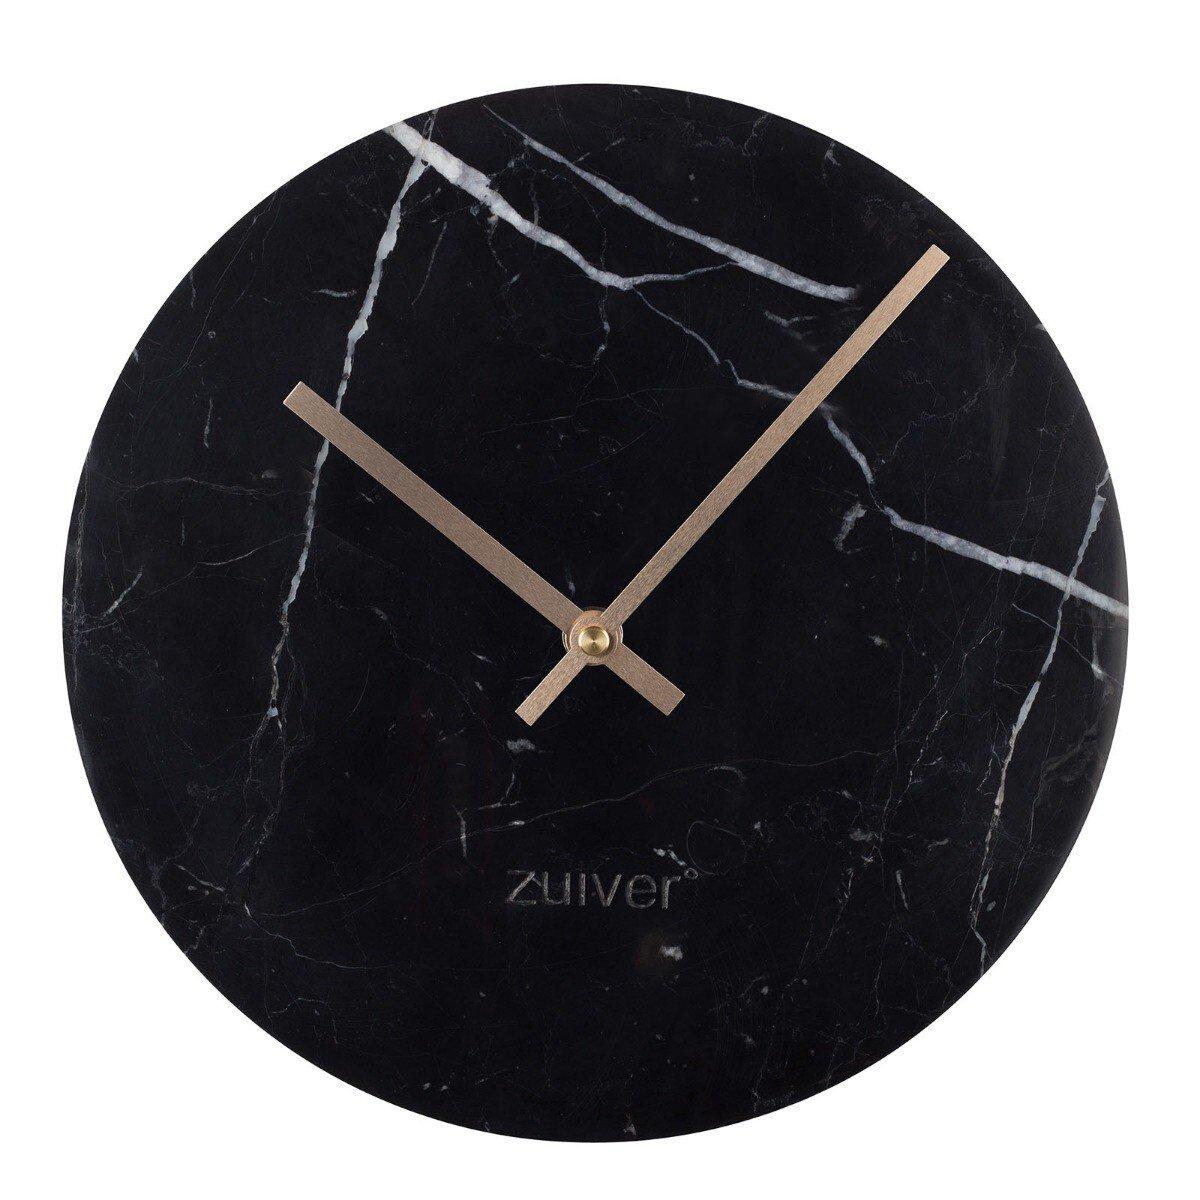 Zuiver Time Wandklok Marmer 25 cm Zwart